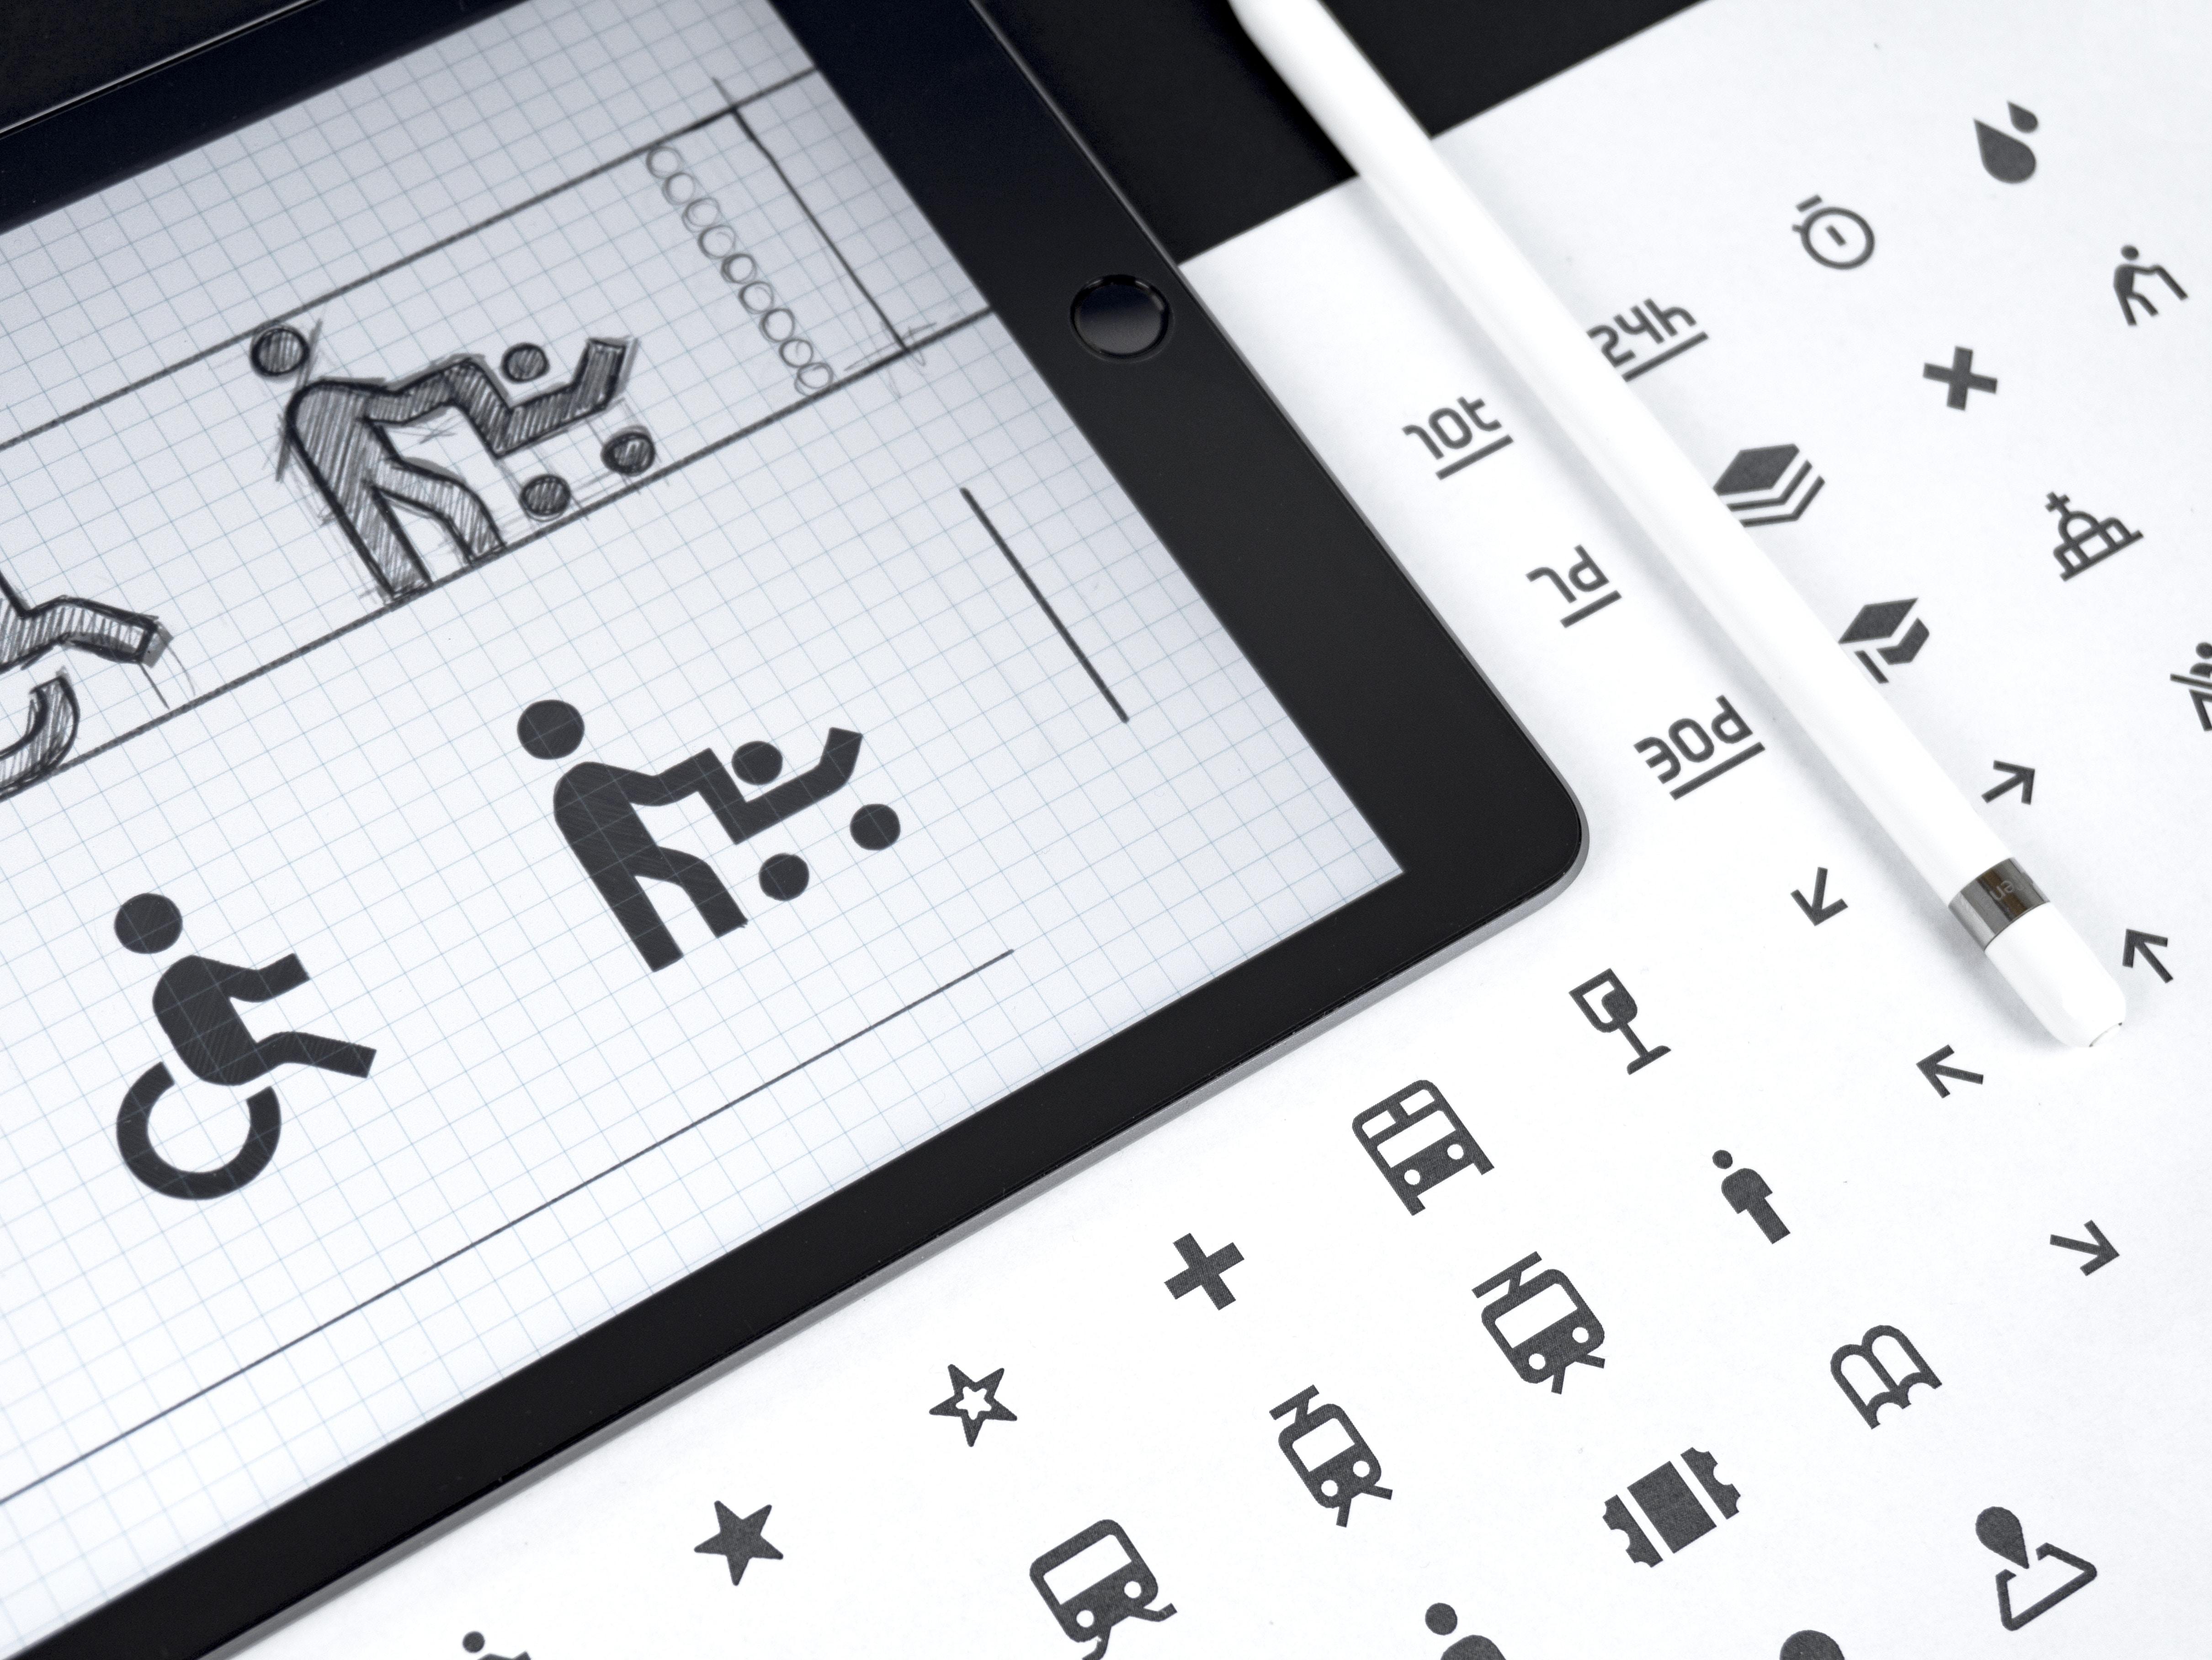 black and white smartphone screenshot